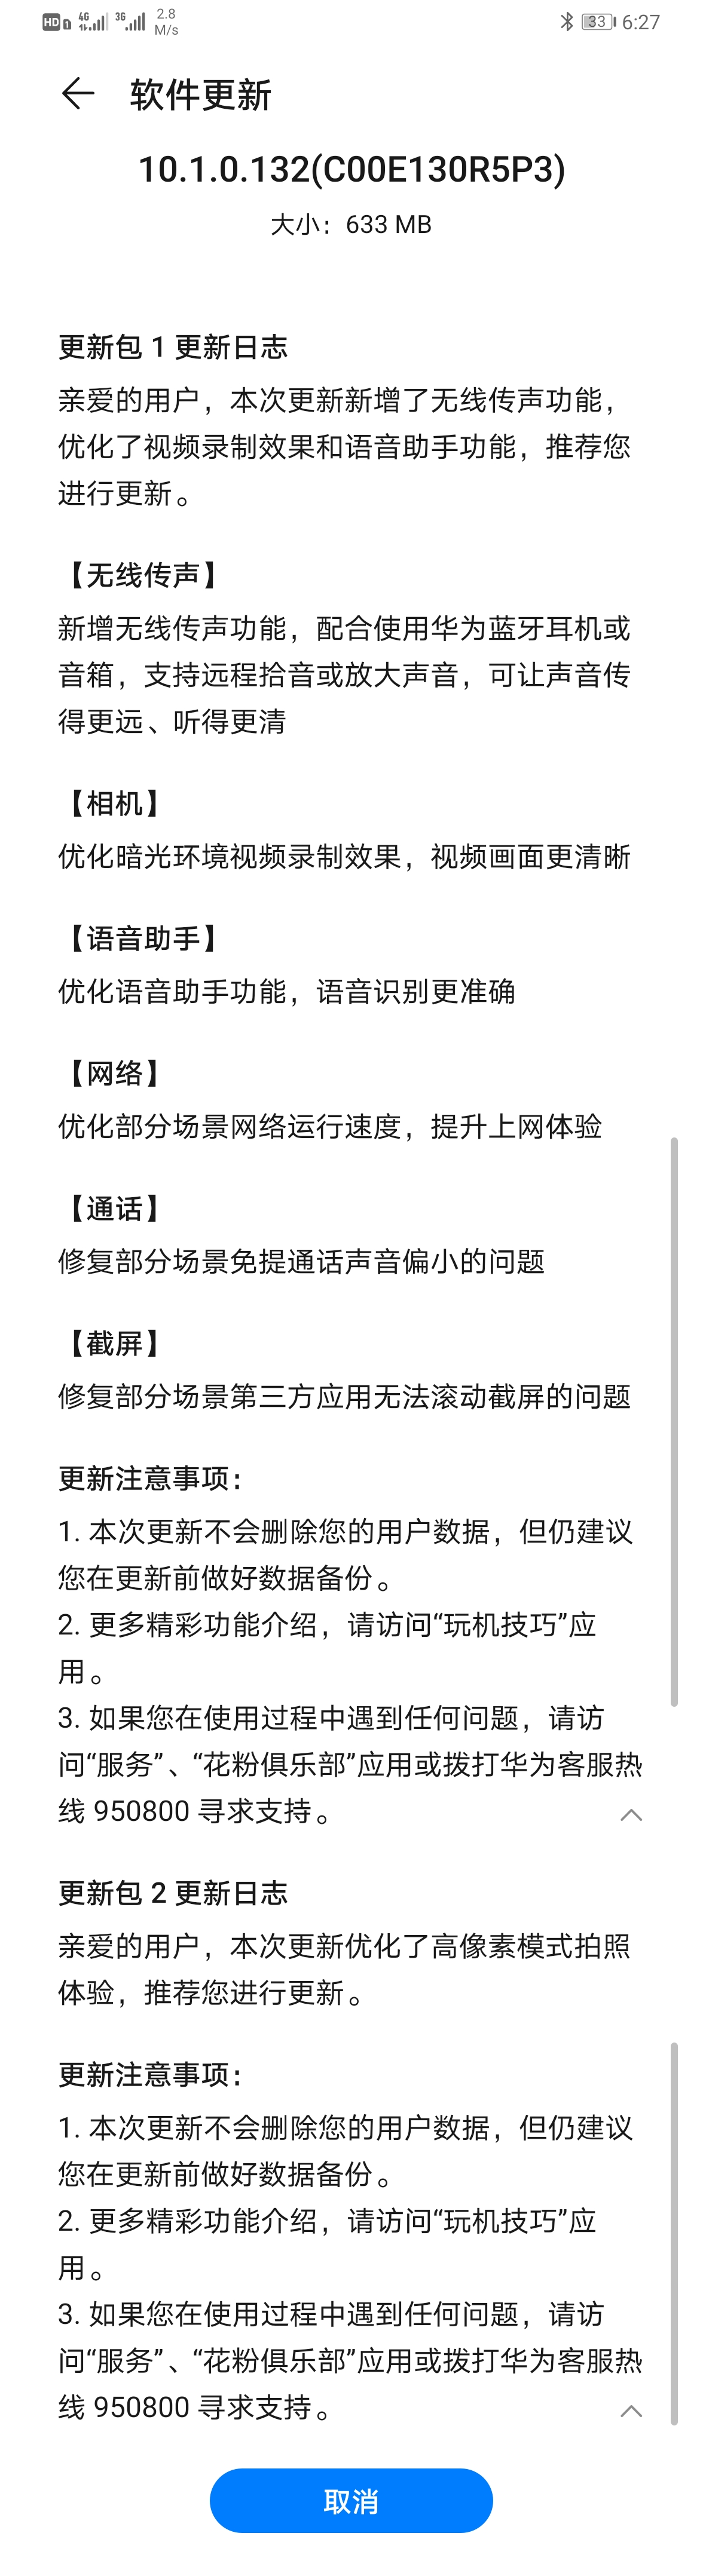 Screenshot_20200513_182749_com.huawei.android.hwouc.jpg